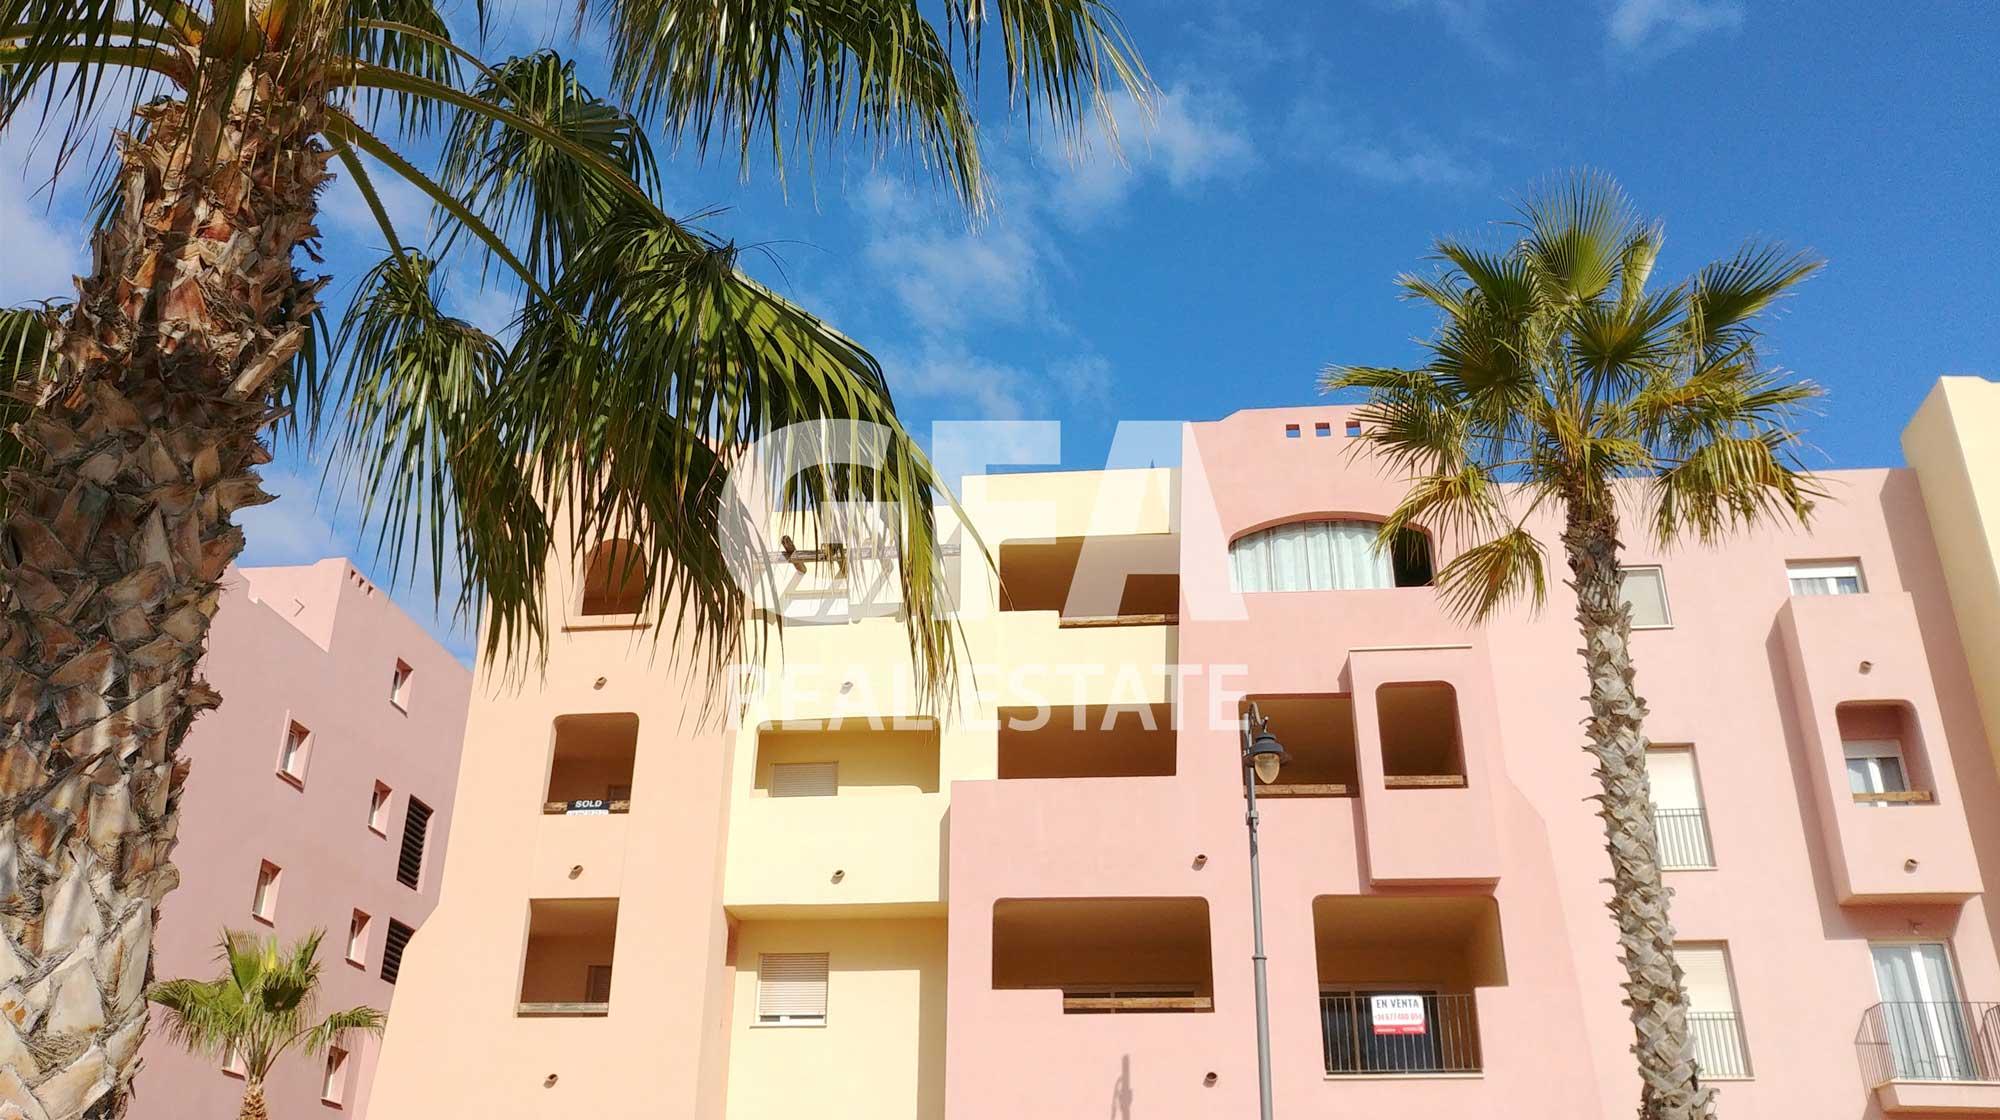 boulevard-viviendas-de-obra-nueva-resort-mar-menor (1)